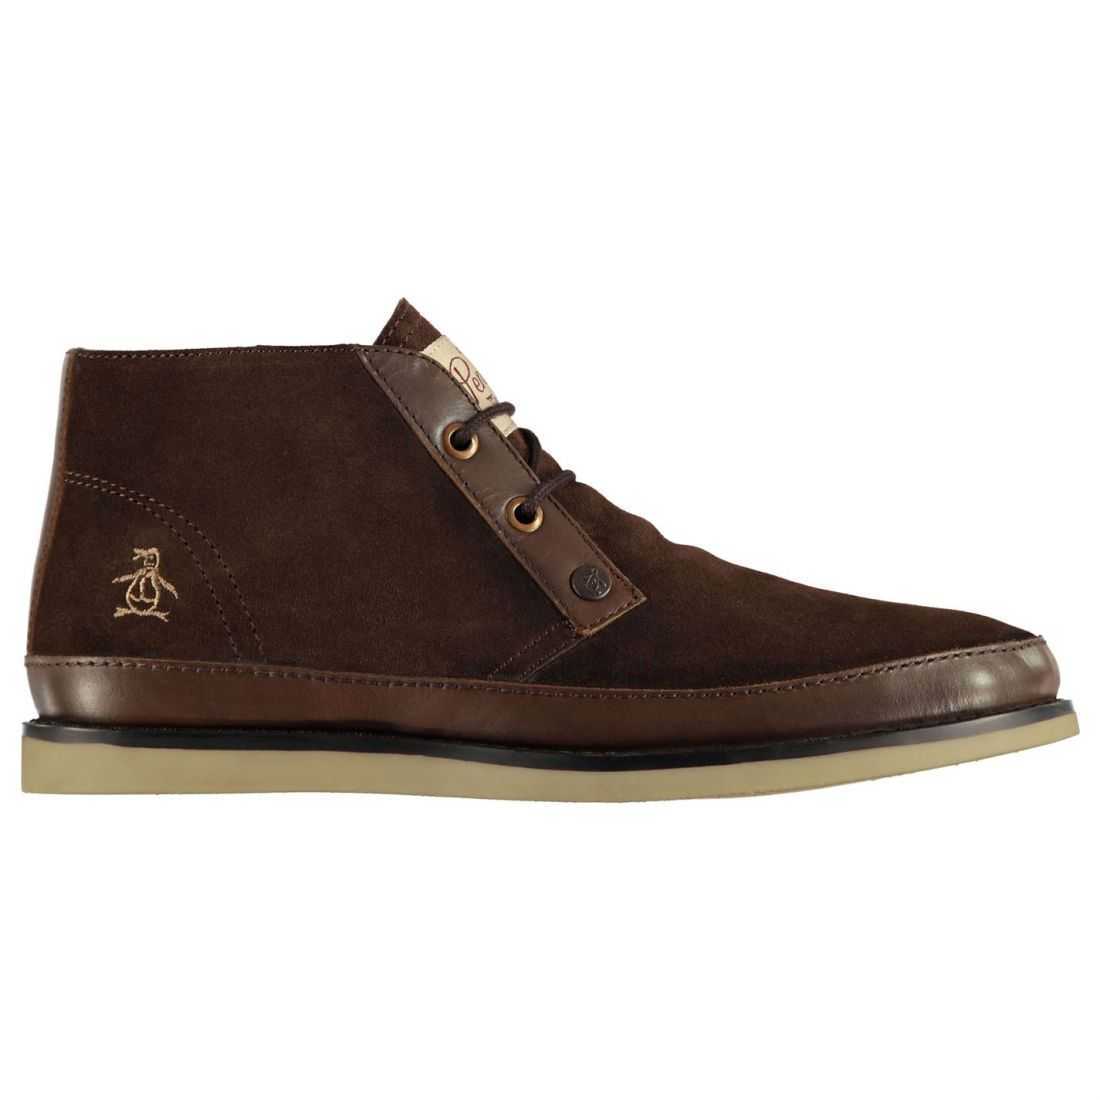 Nice Boys Original Penguin Navy Shoes Suede Lace Up Desert Boots Uk 4 Kids' Clothing, Shoes & Accs